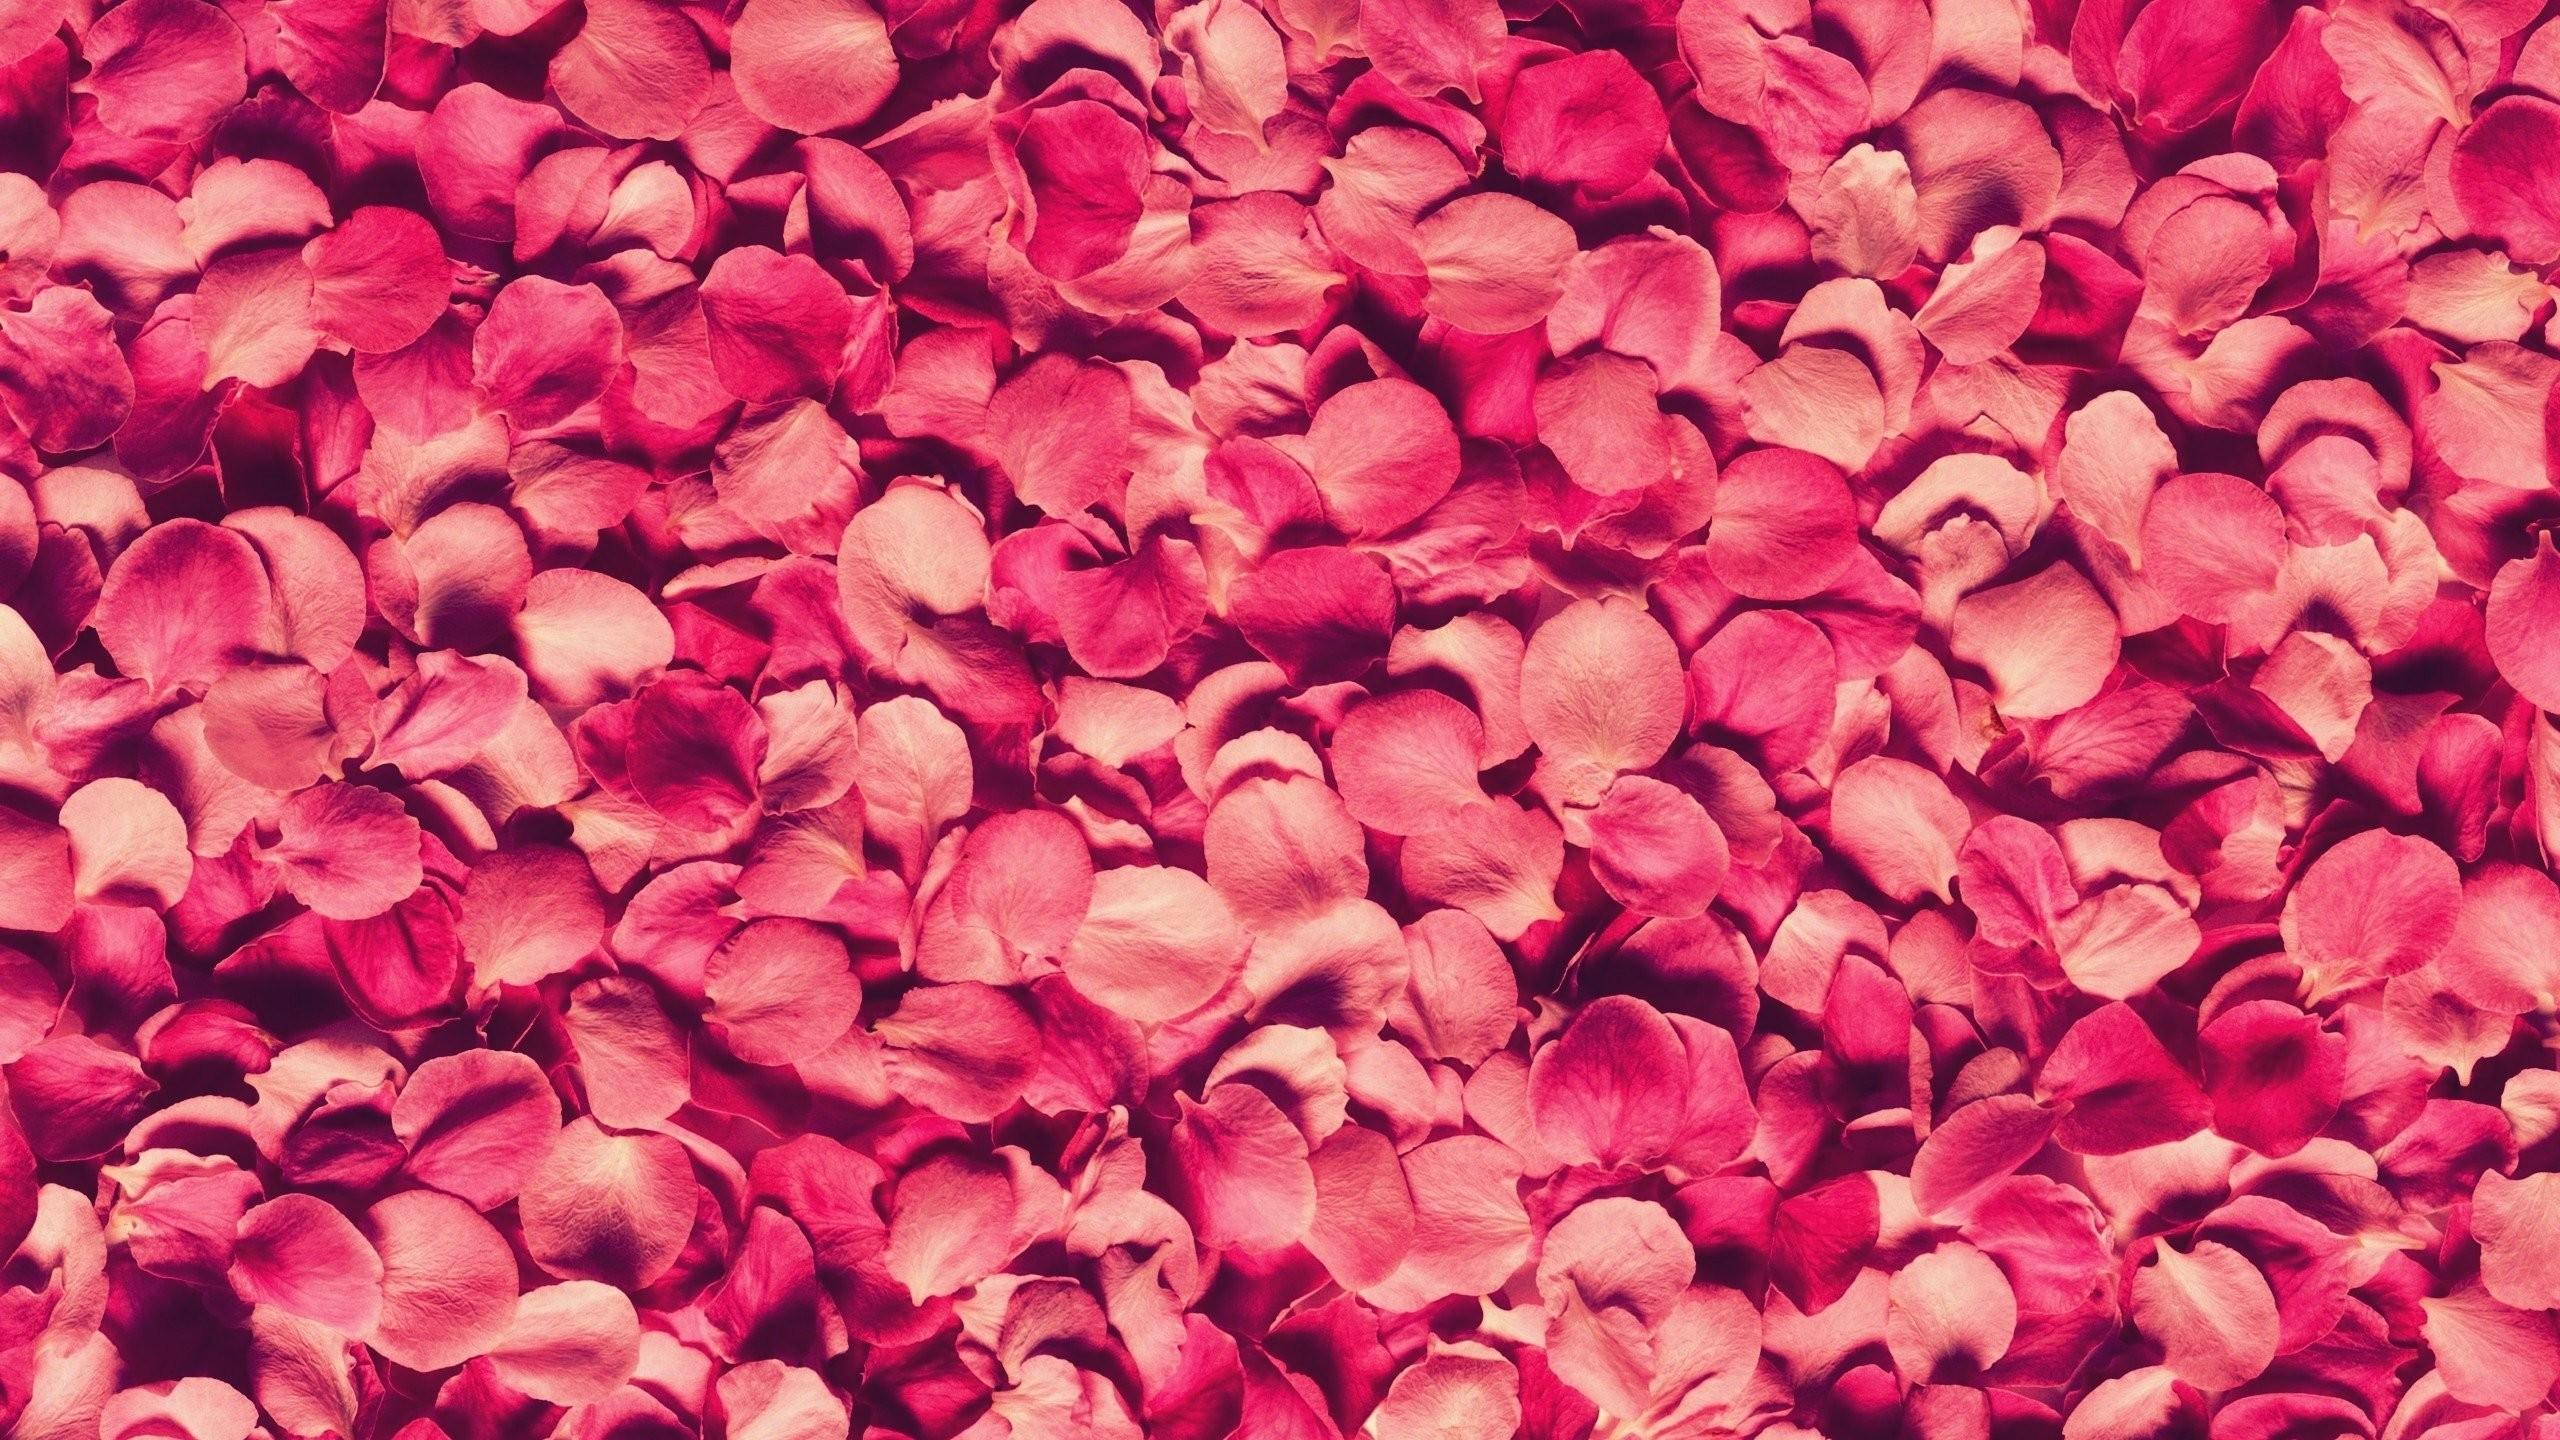 Ipad Wallpaper Little Plant In A Bubble: Pink Bubbles Wallpaper (71+ Images